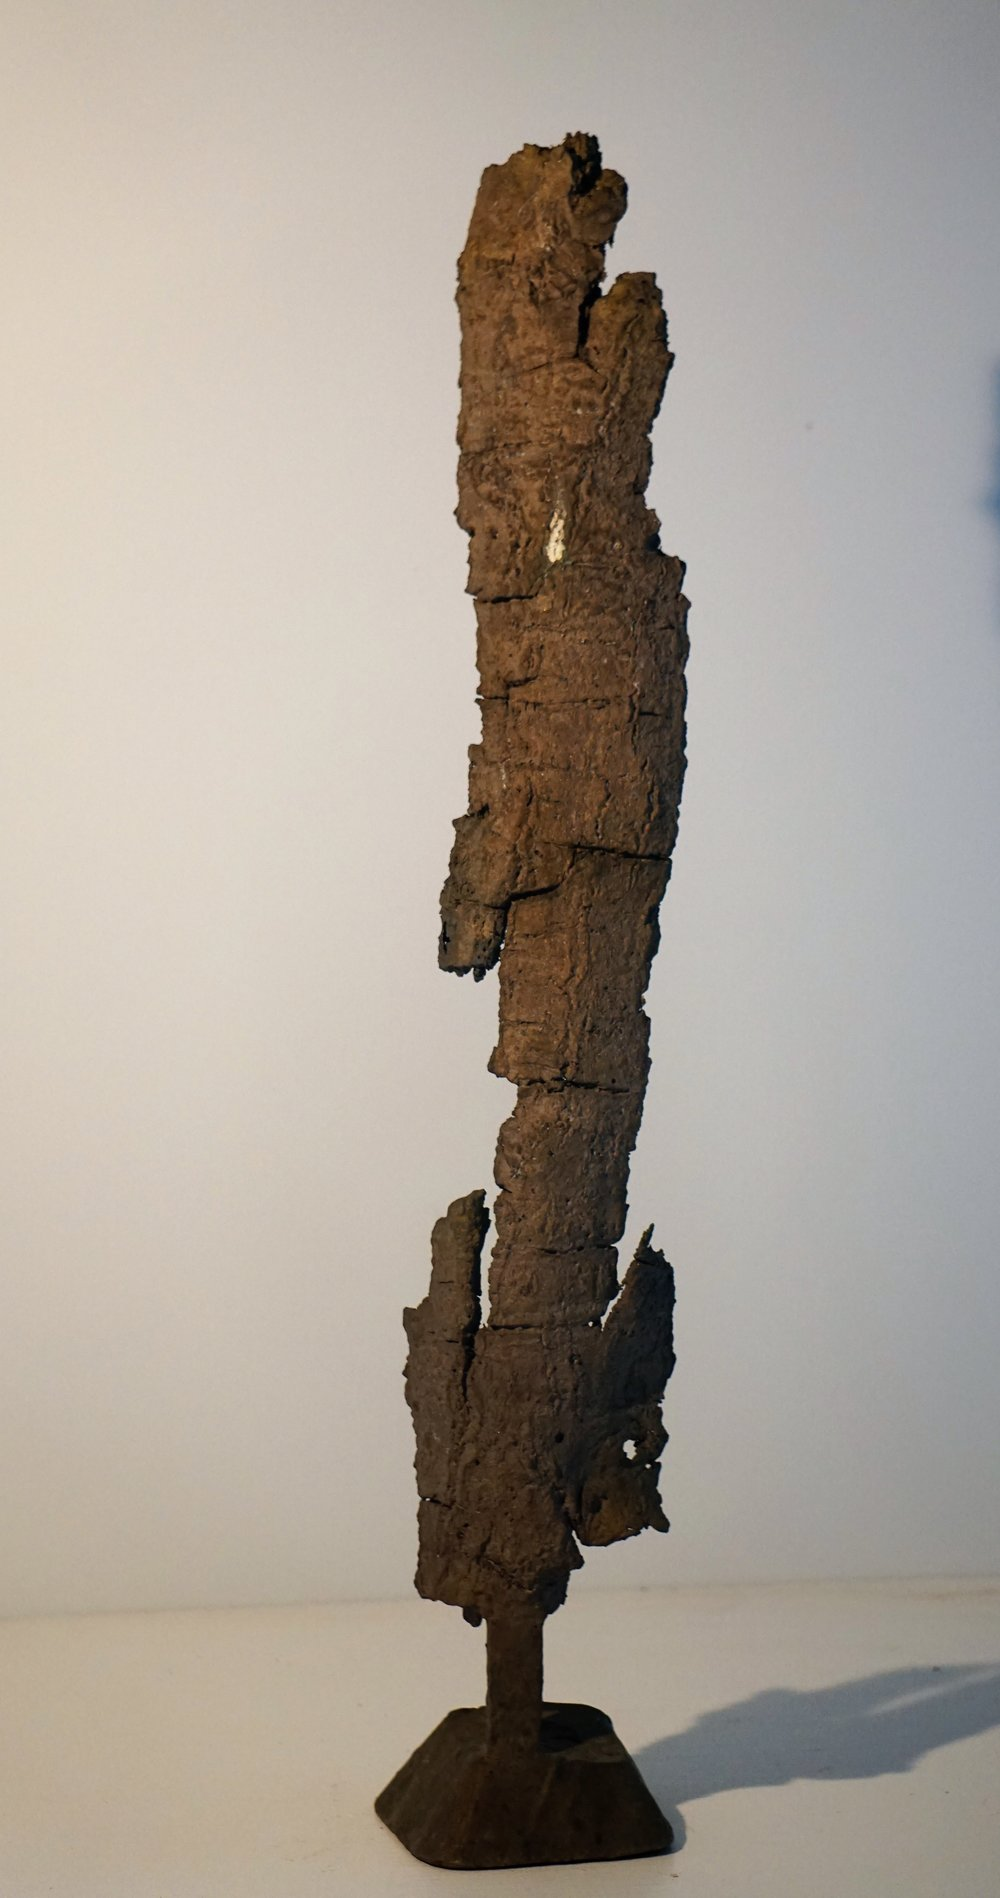 Bark #13